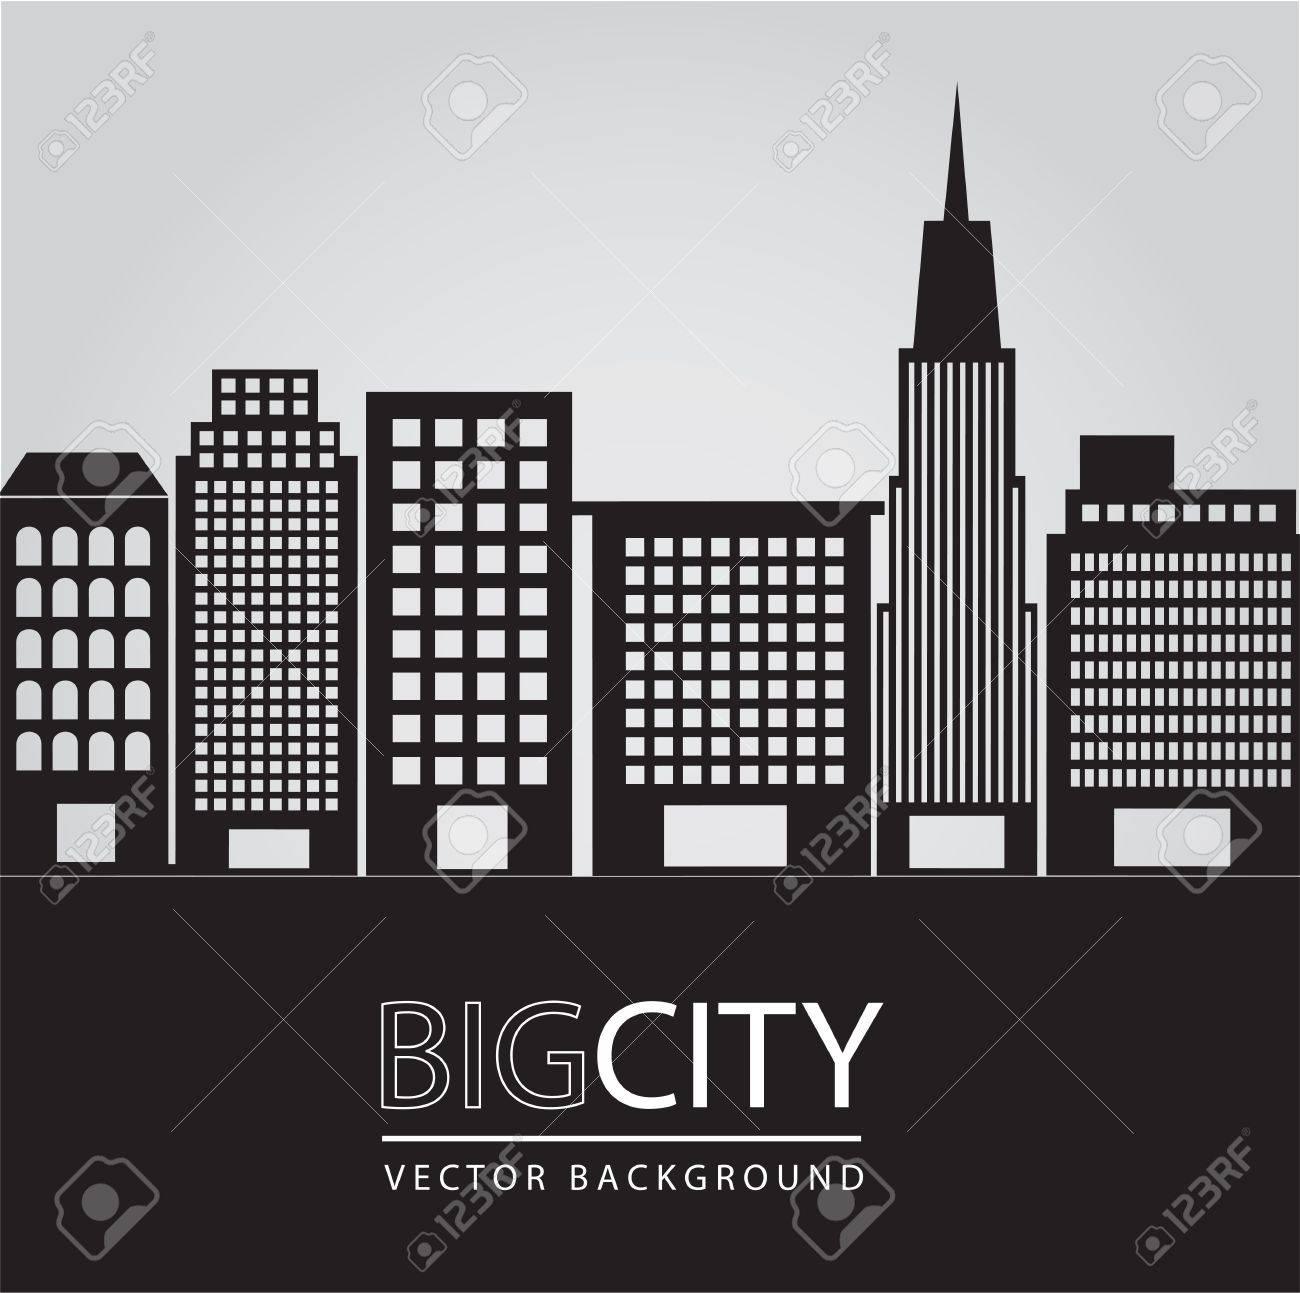 Big city illustration, conceptual image, vector illustration Stock Vector - 14375113